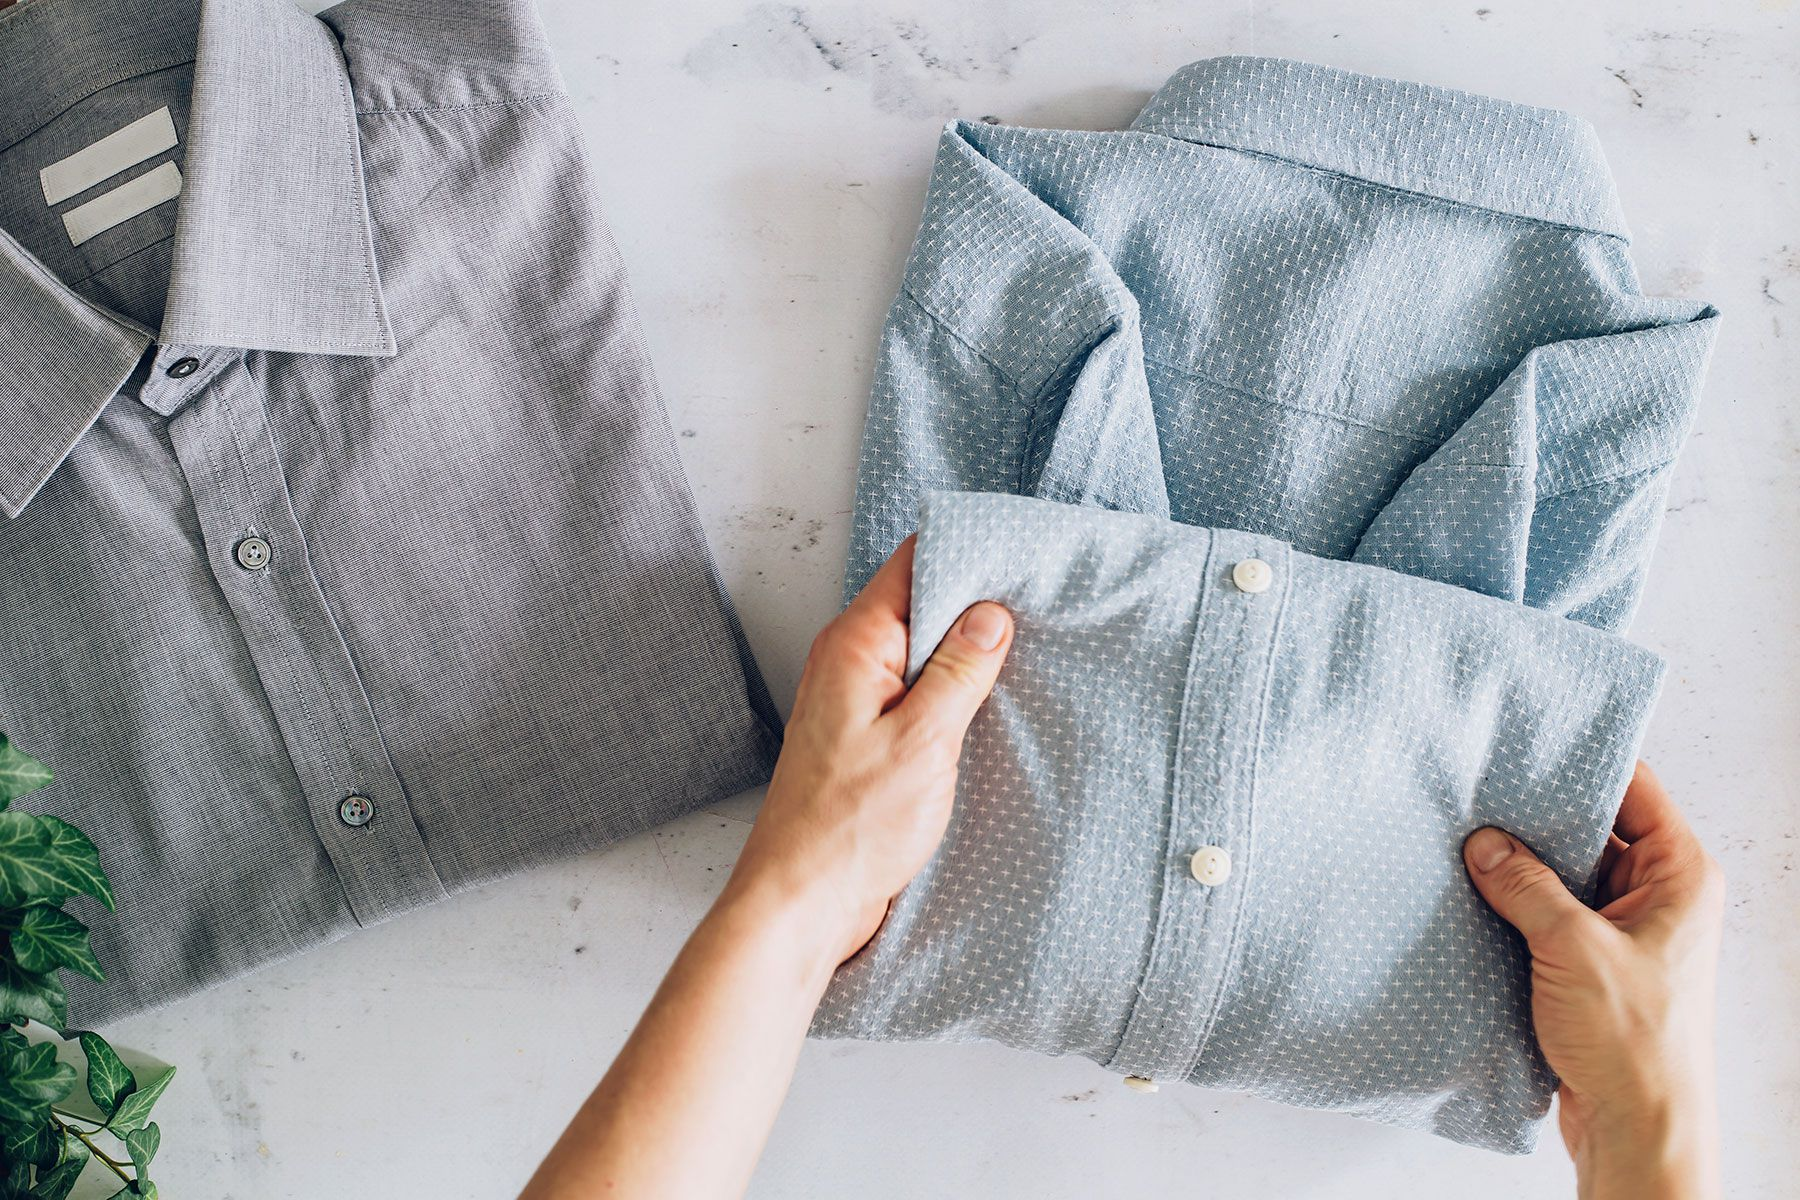 6 Clothes Folding Techniques That Save Space